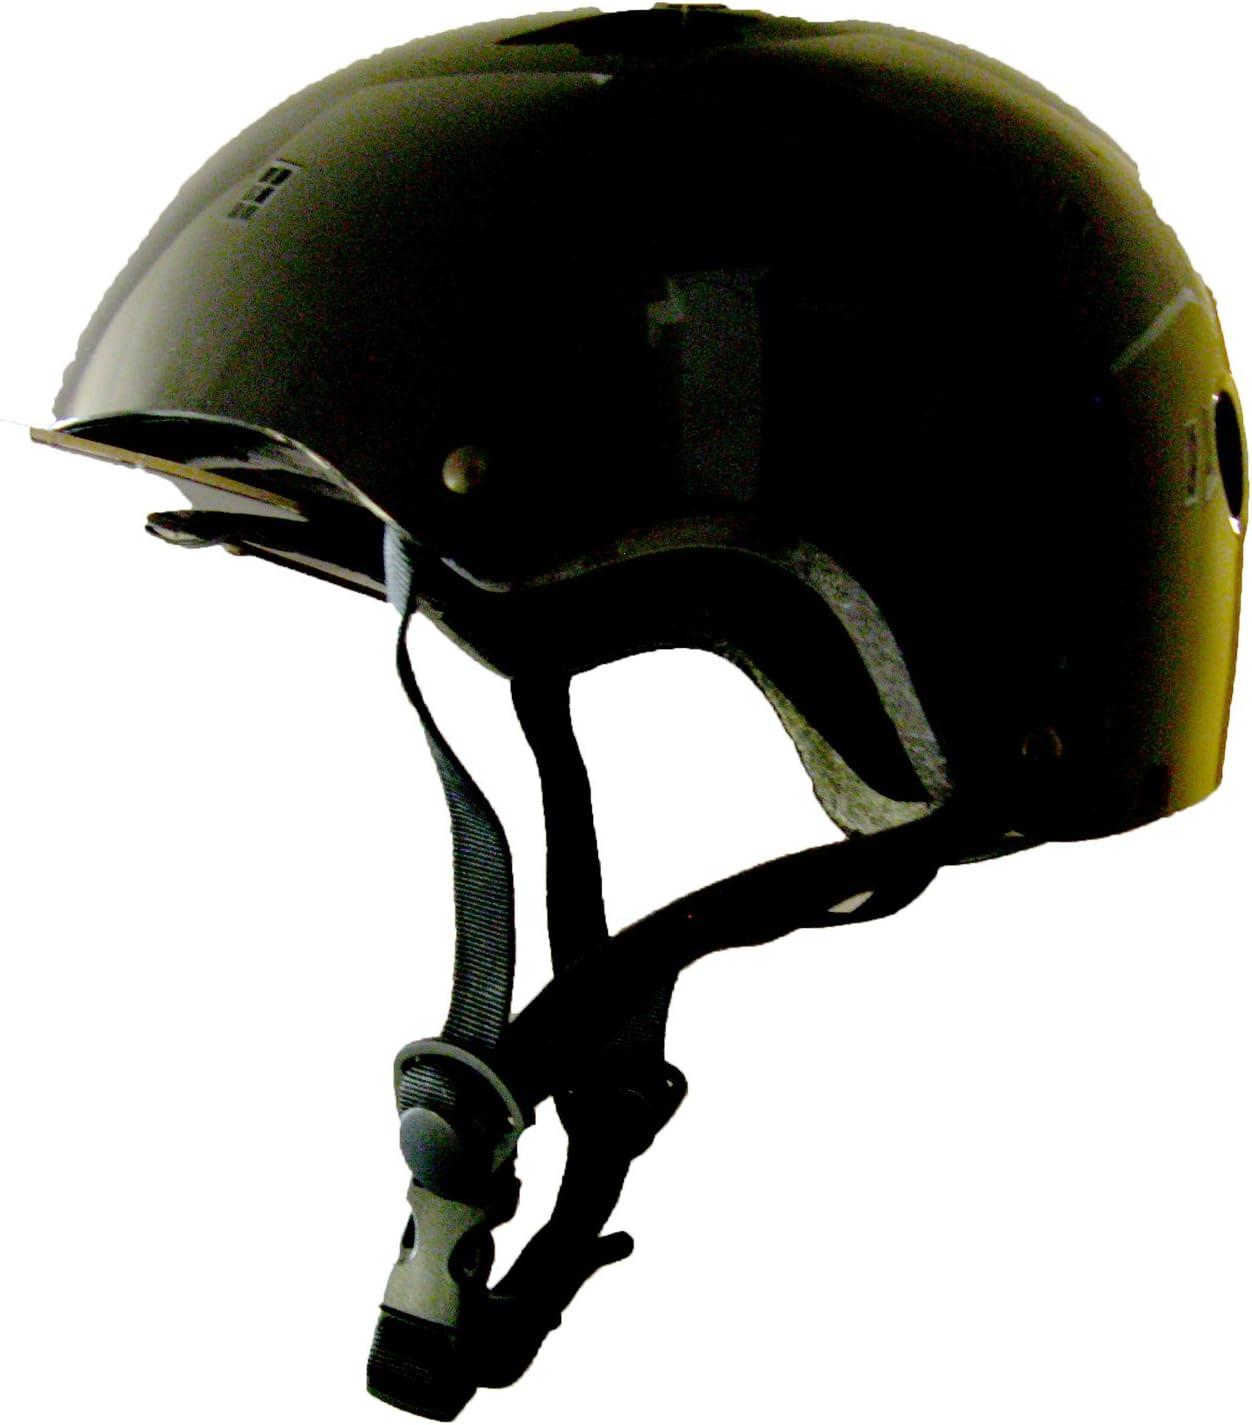 Kryptonics Pro-Shaped Skateboarding Helmet by Kryptonics